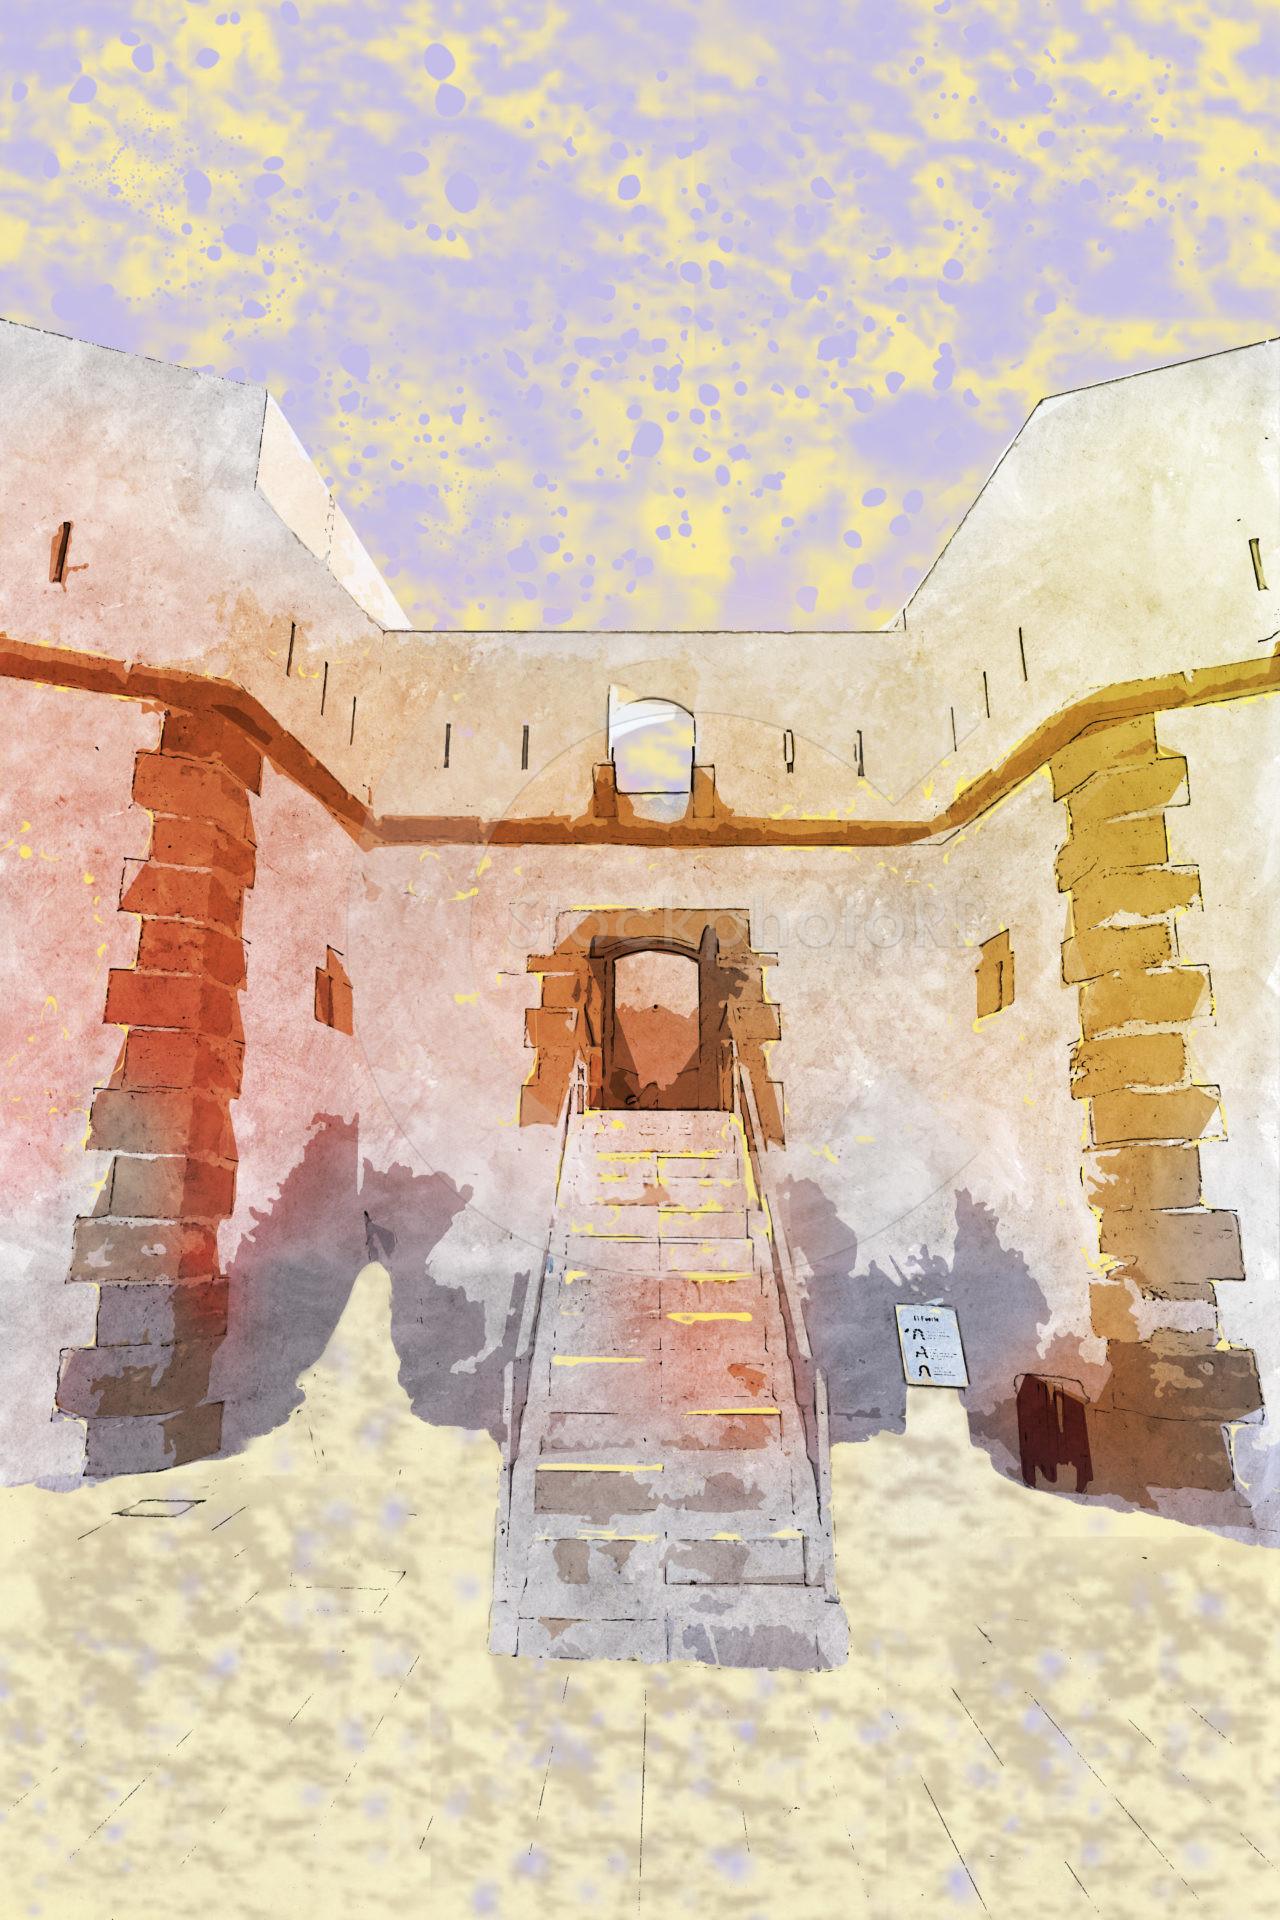 Castle of San Juan de las Aguilas